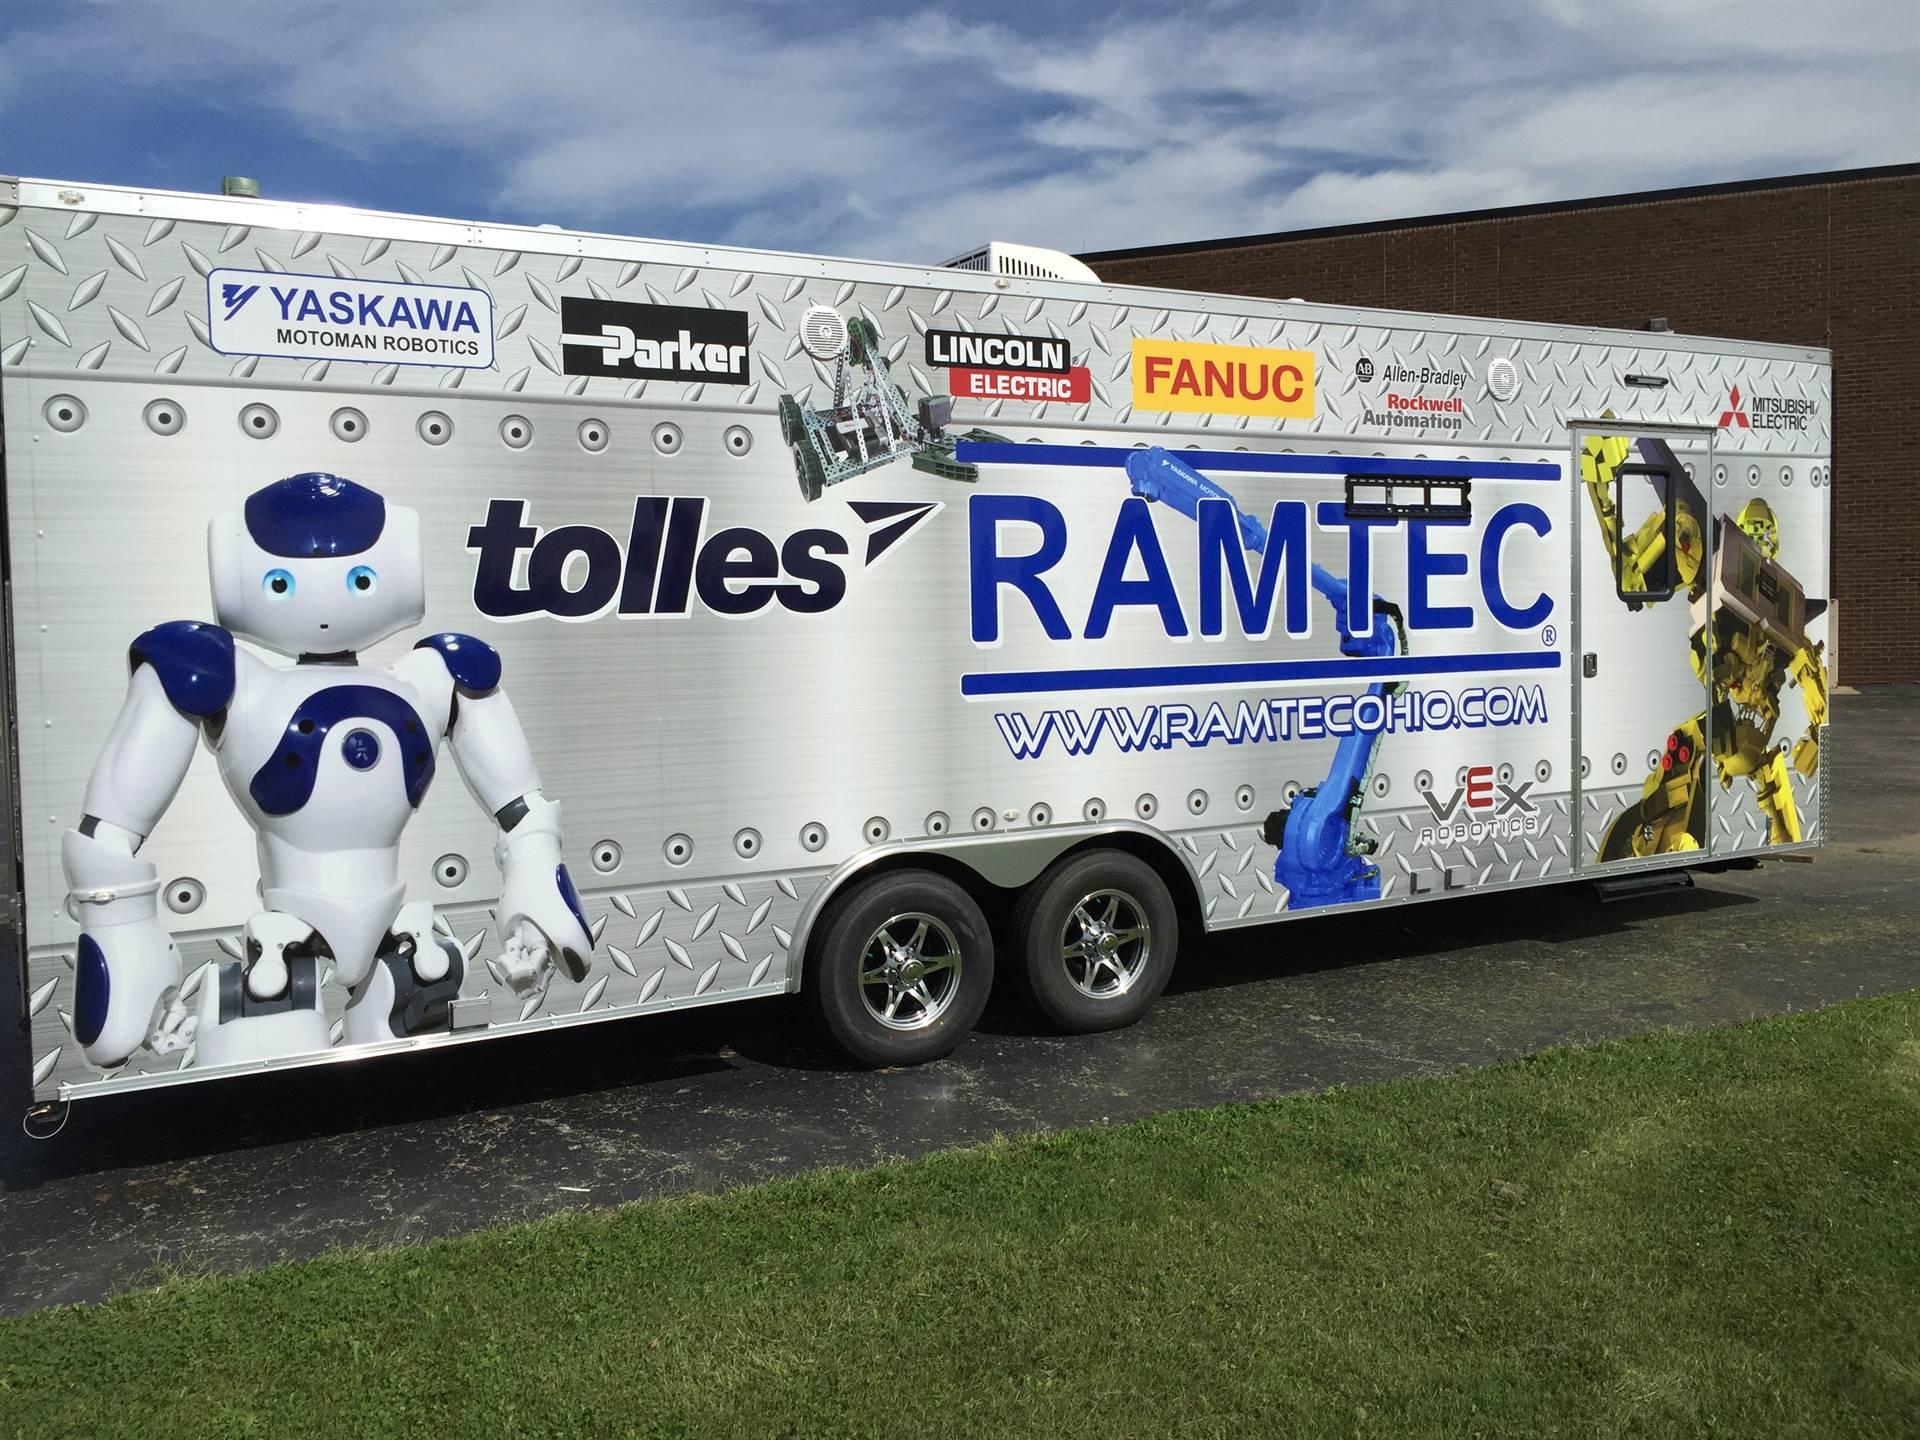 RAMTEC Mobile Lab